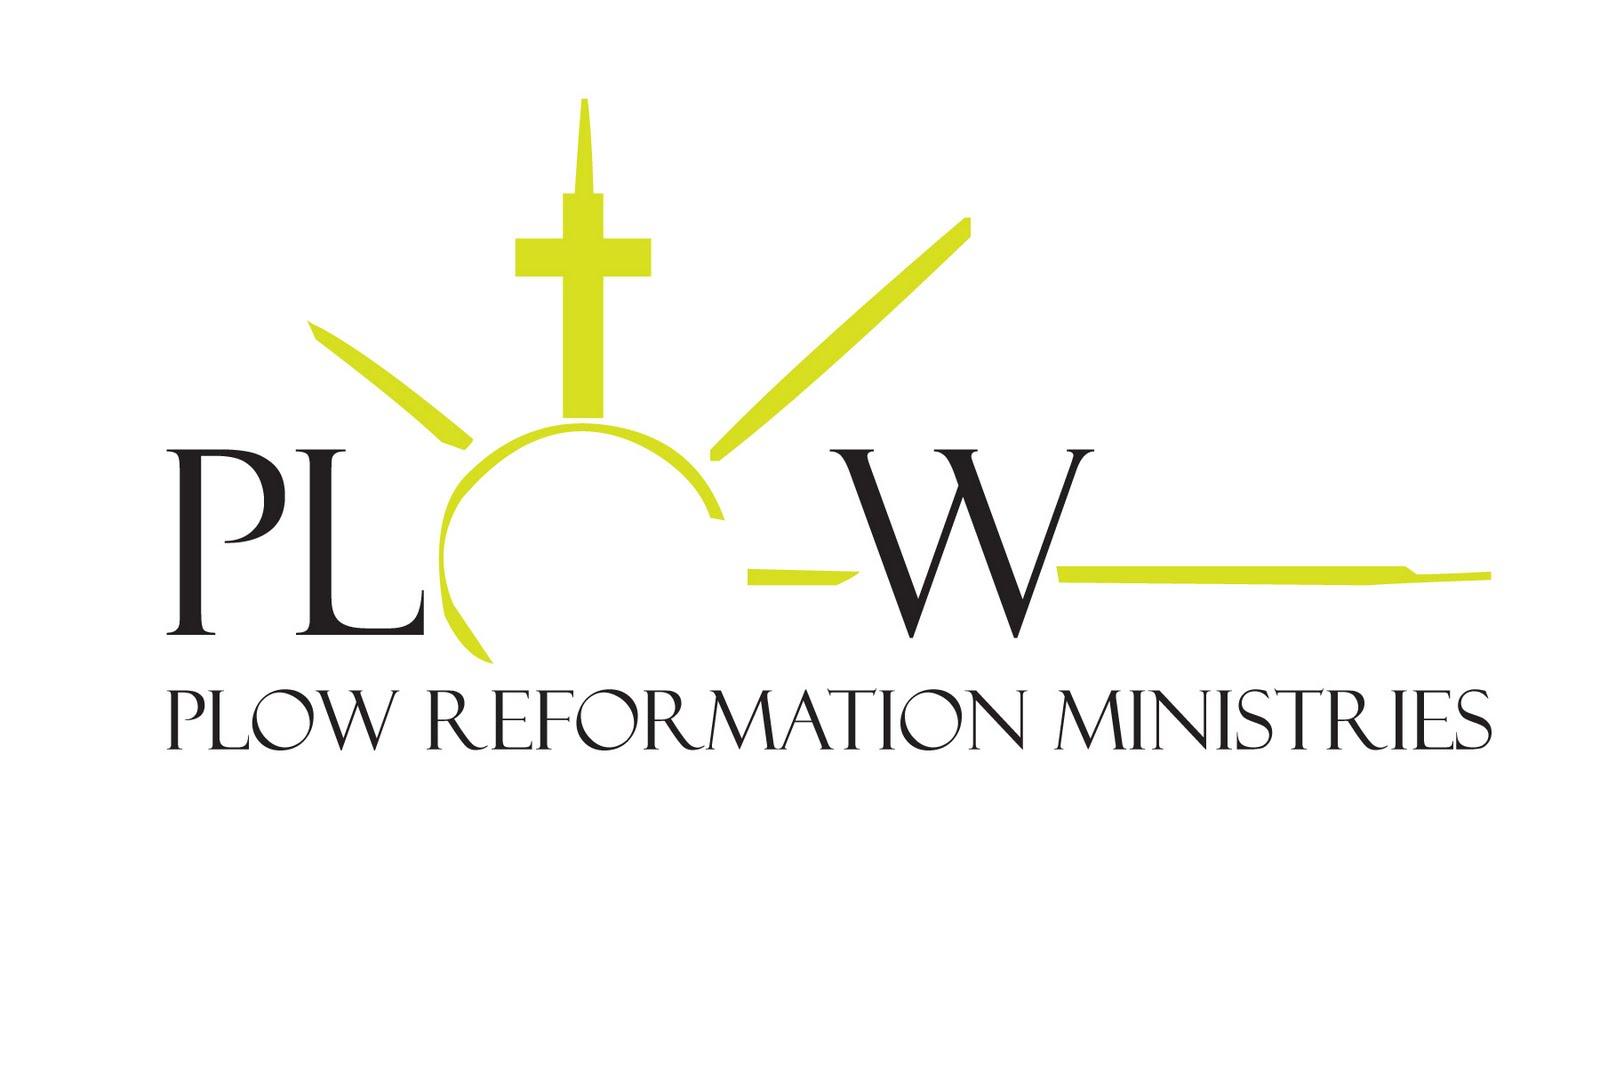 Plow Reformation Ministries International